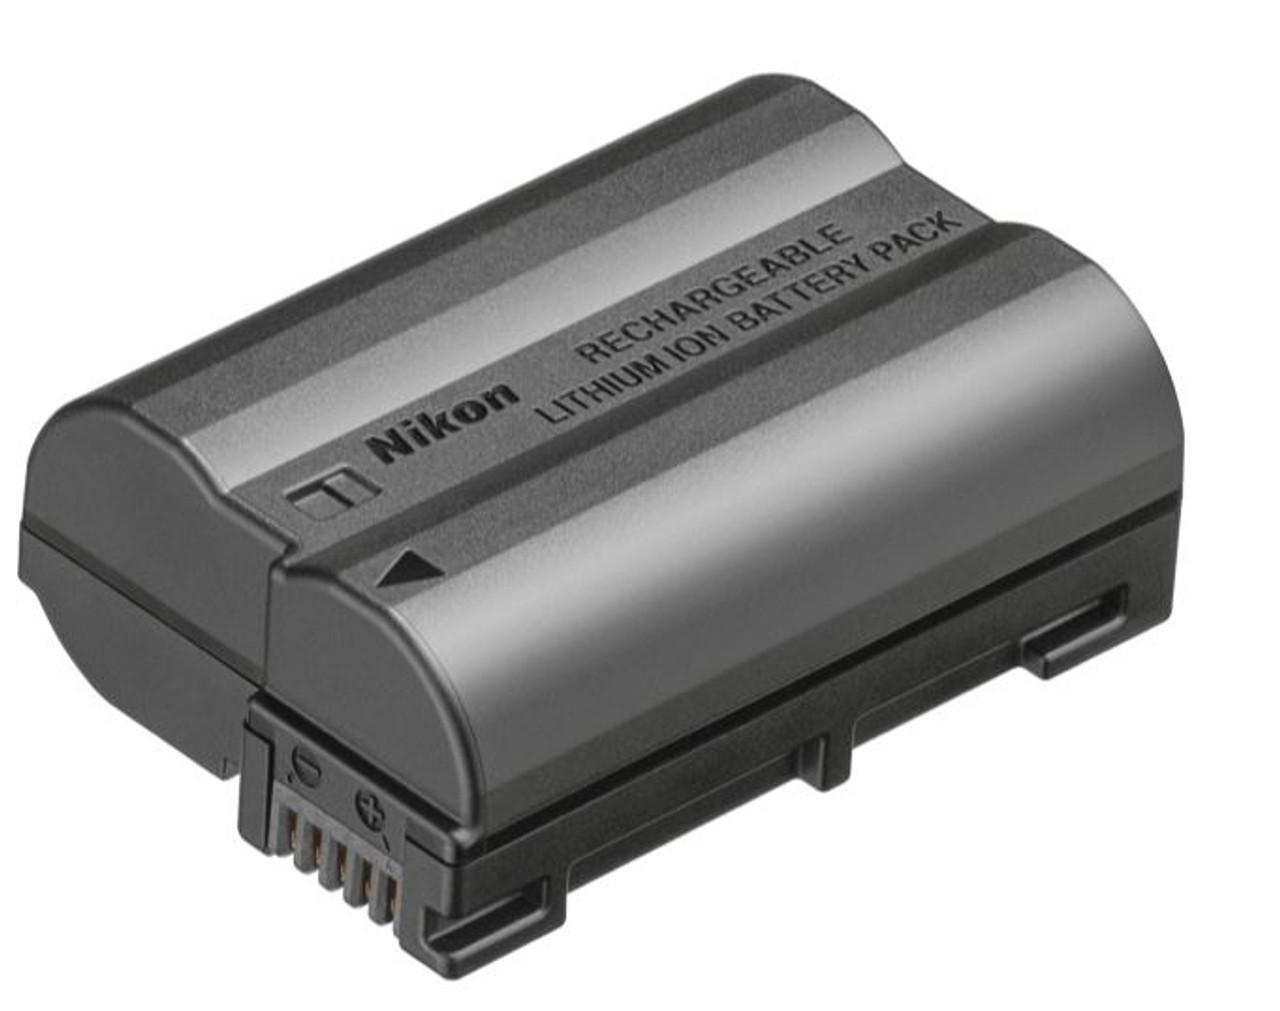 Nikon EN-EL15c Rechargeable Lithium-Ion Battery